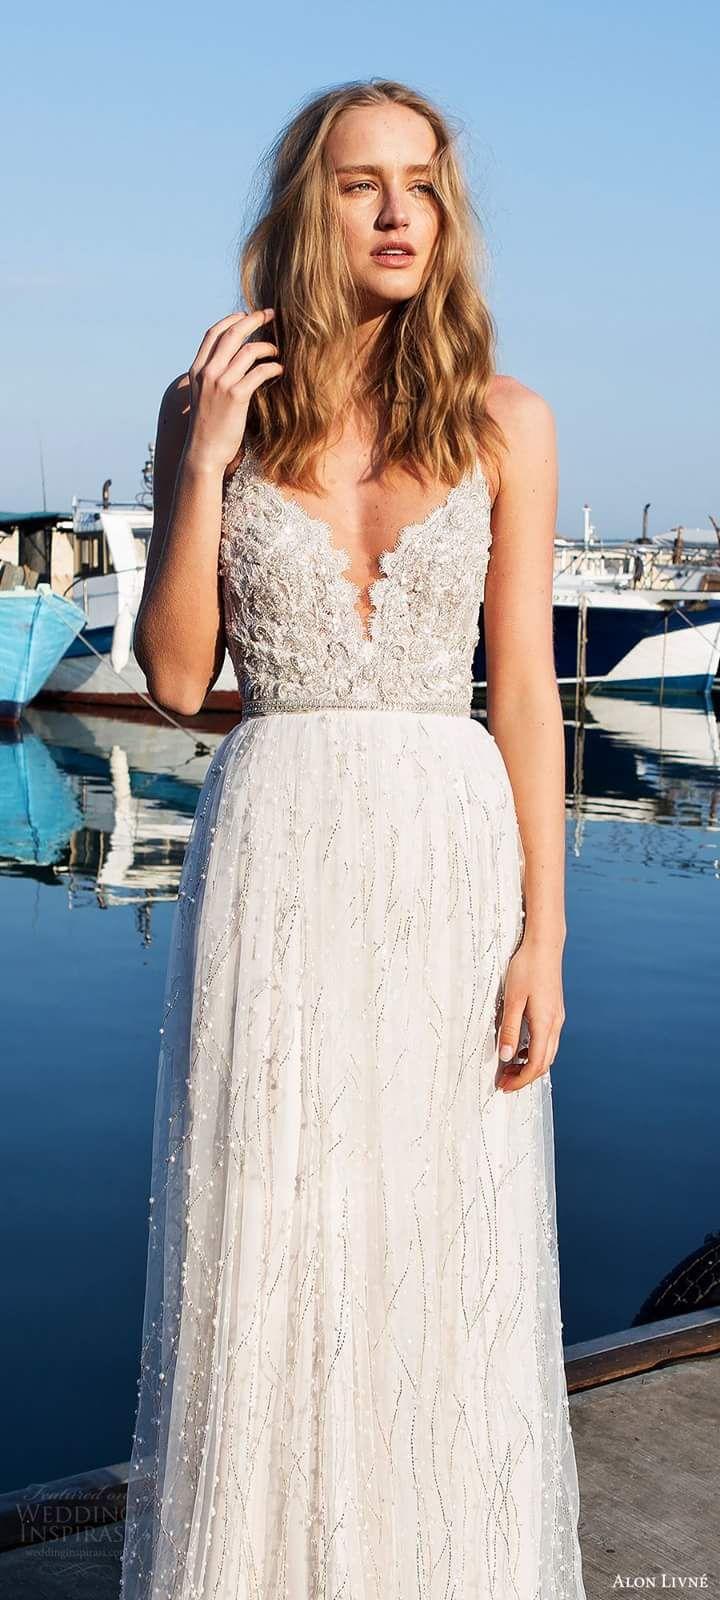 60+ Chic Boho Wedding Dresses for a Perfect Gypsy-Style Wedding ...